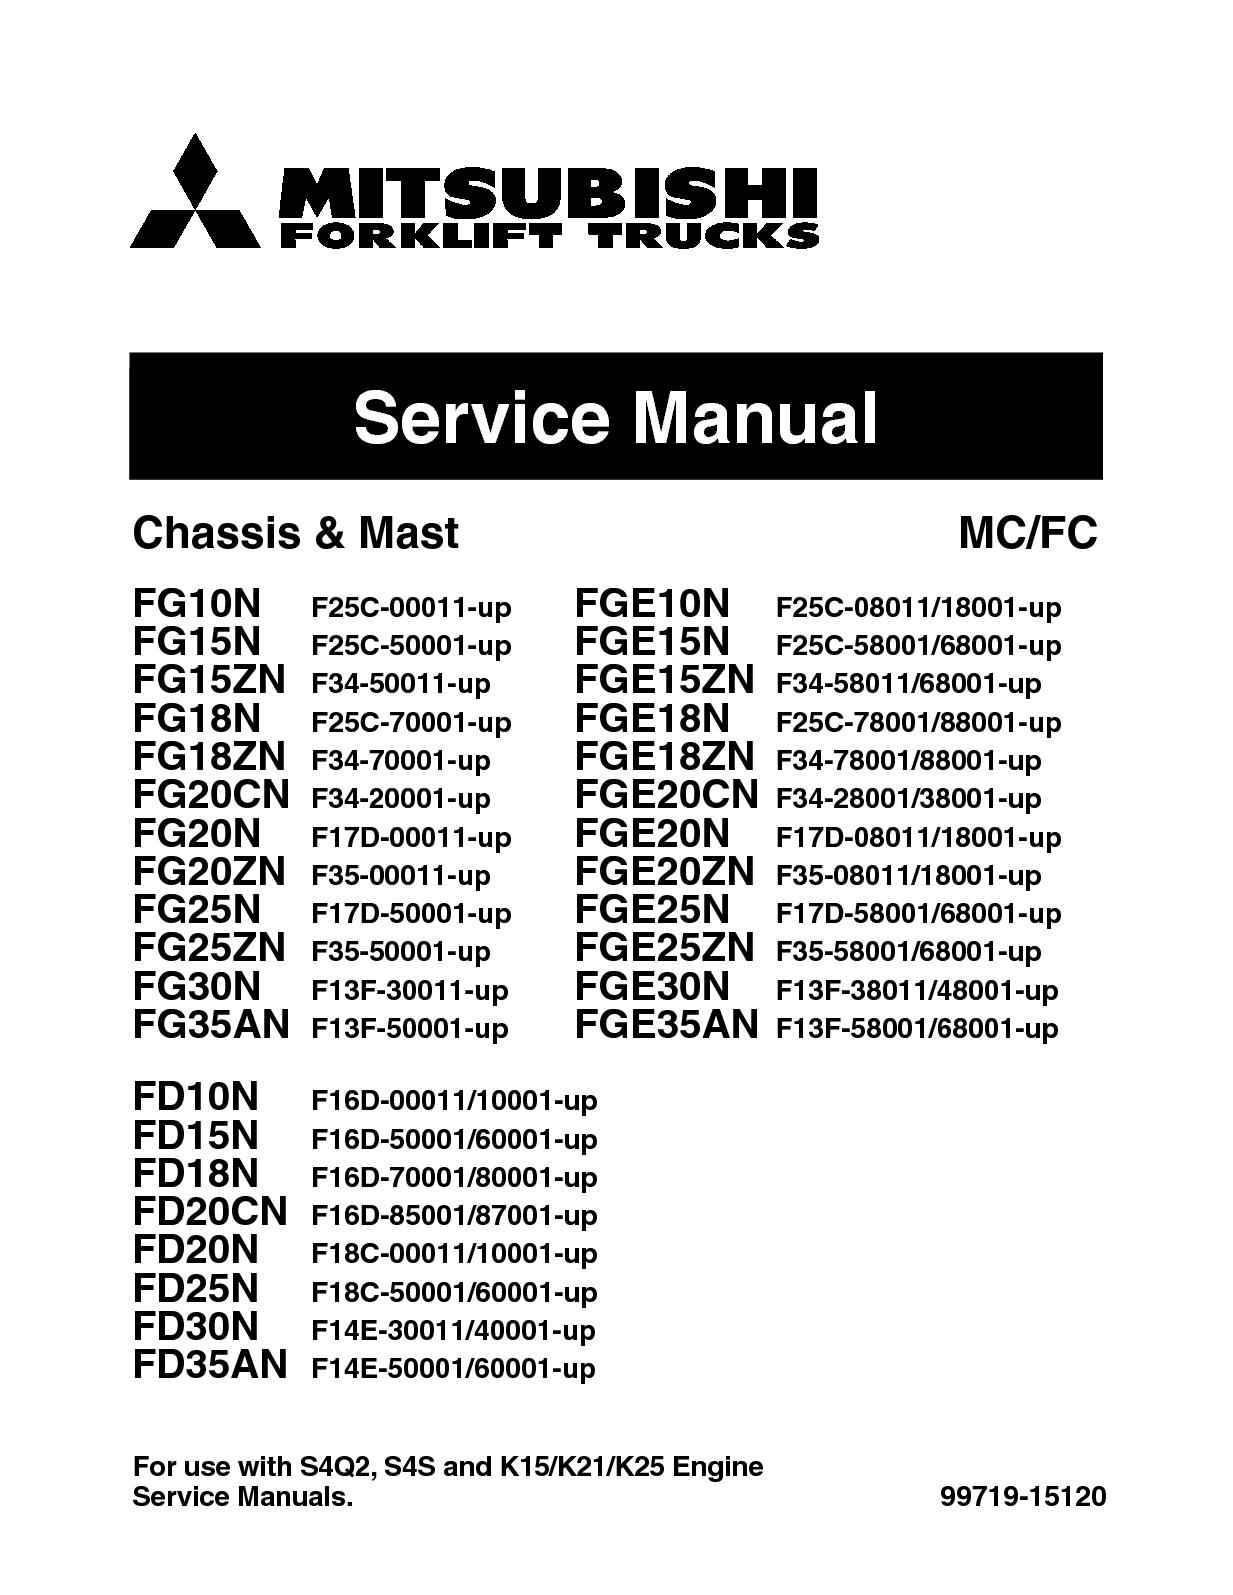 Calaméo - MITSUBISHI FD10N FORKLIFT TRUCKS Service Repair Manual SN:F16D  04001 UP